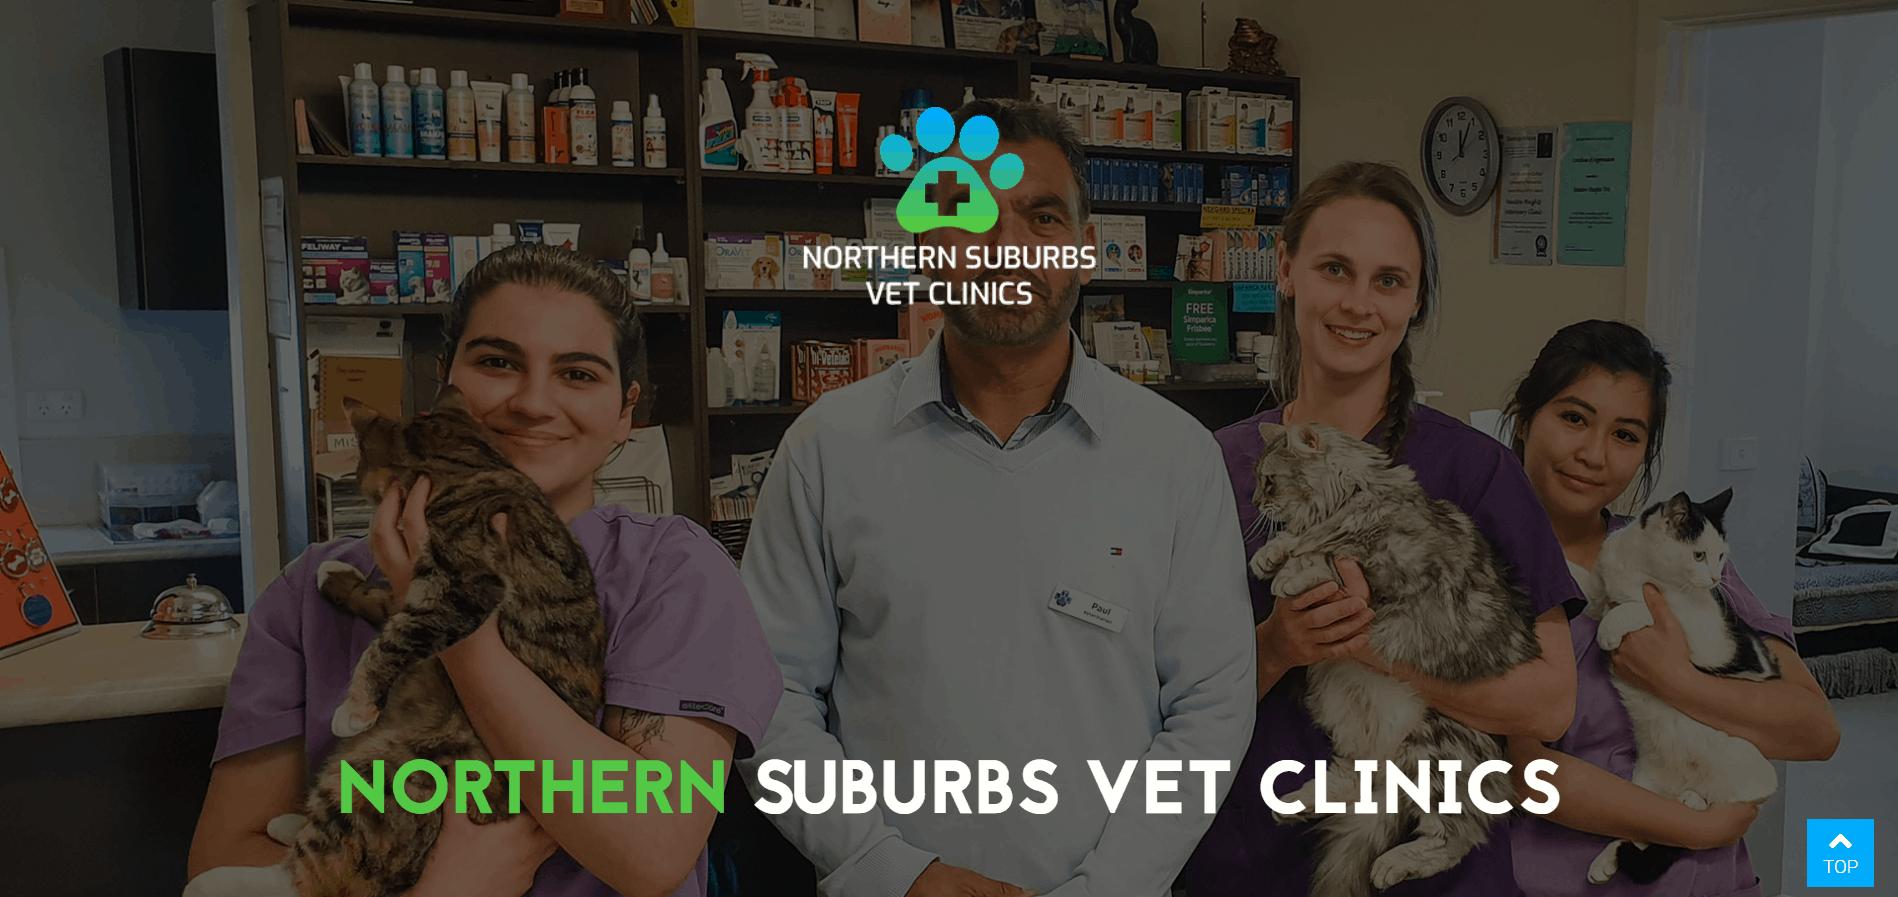 Northern Suburbs Veterinary Clinics